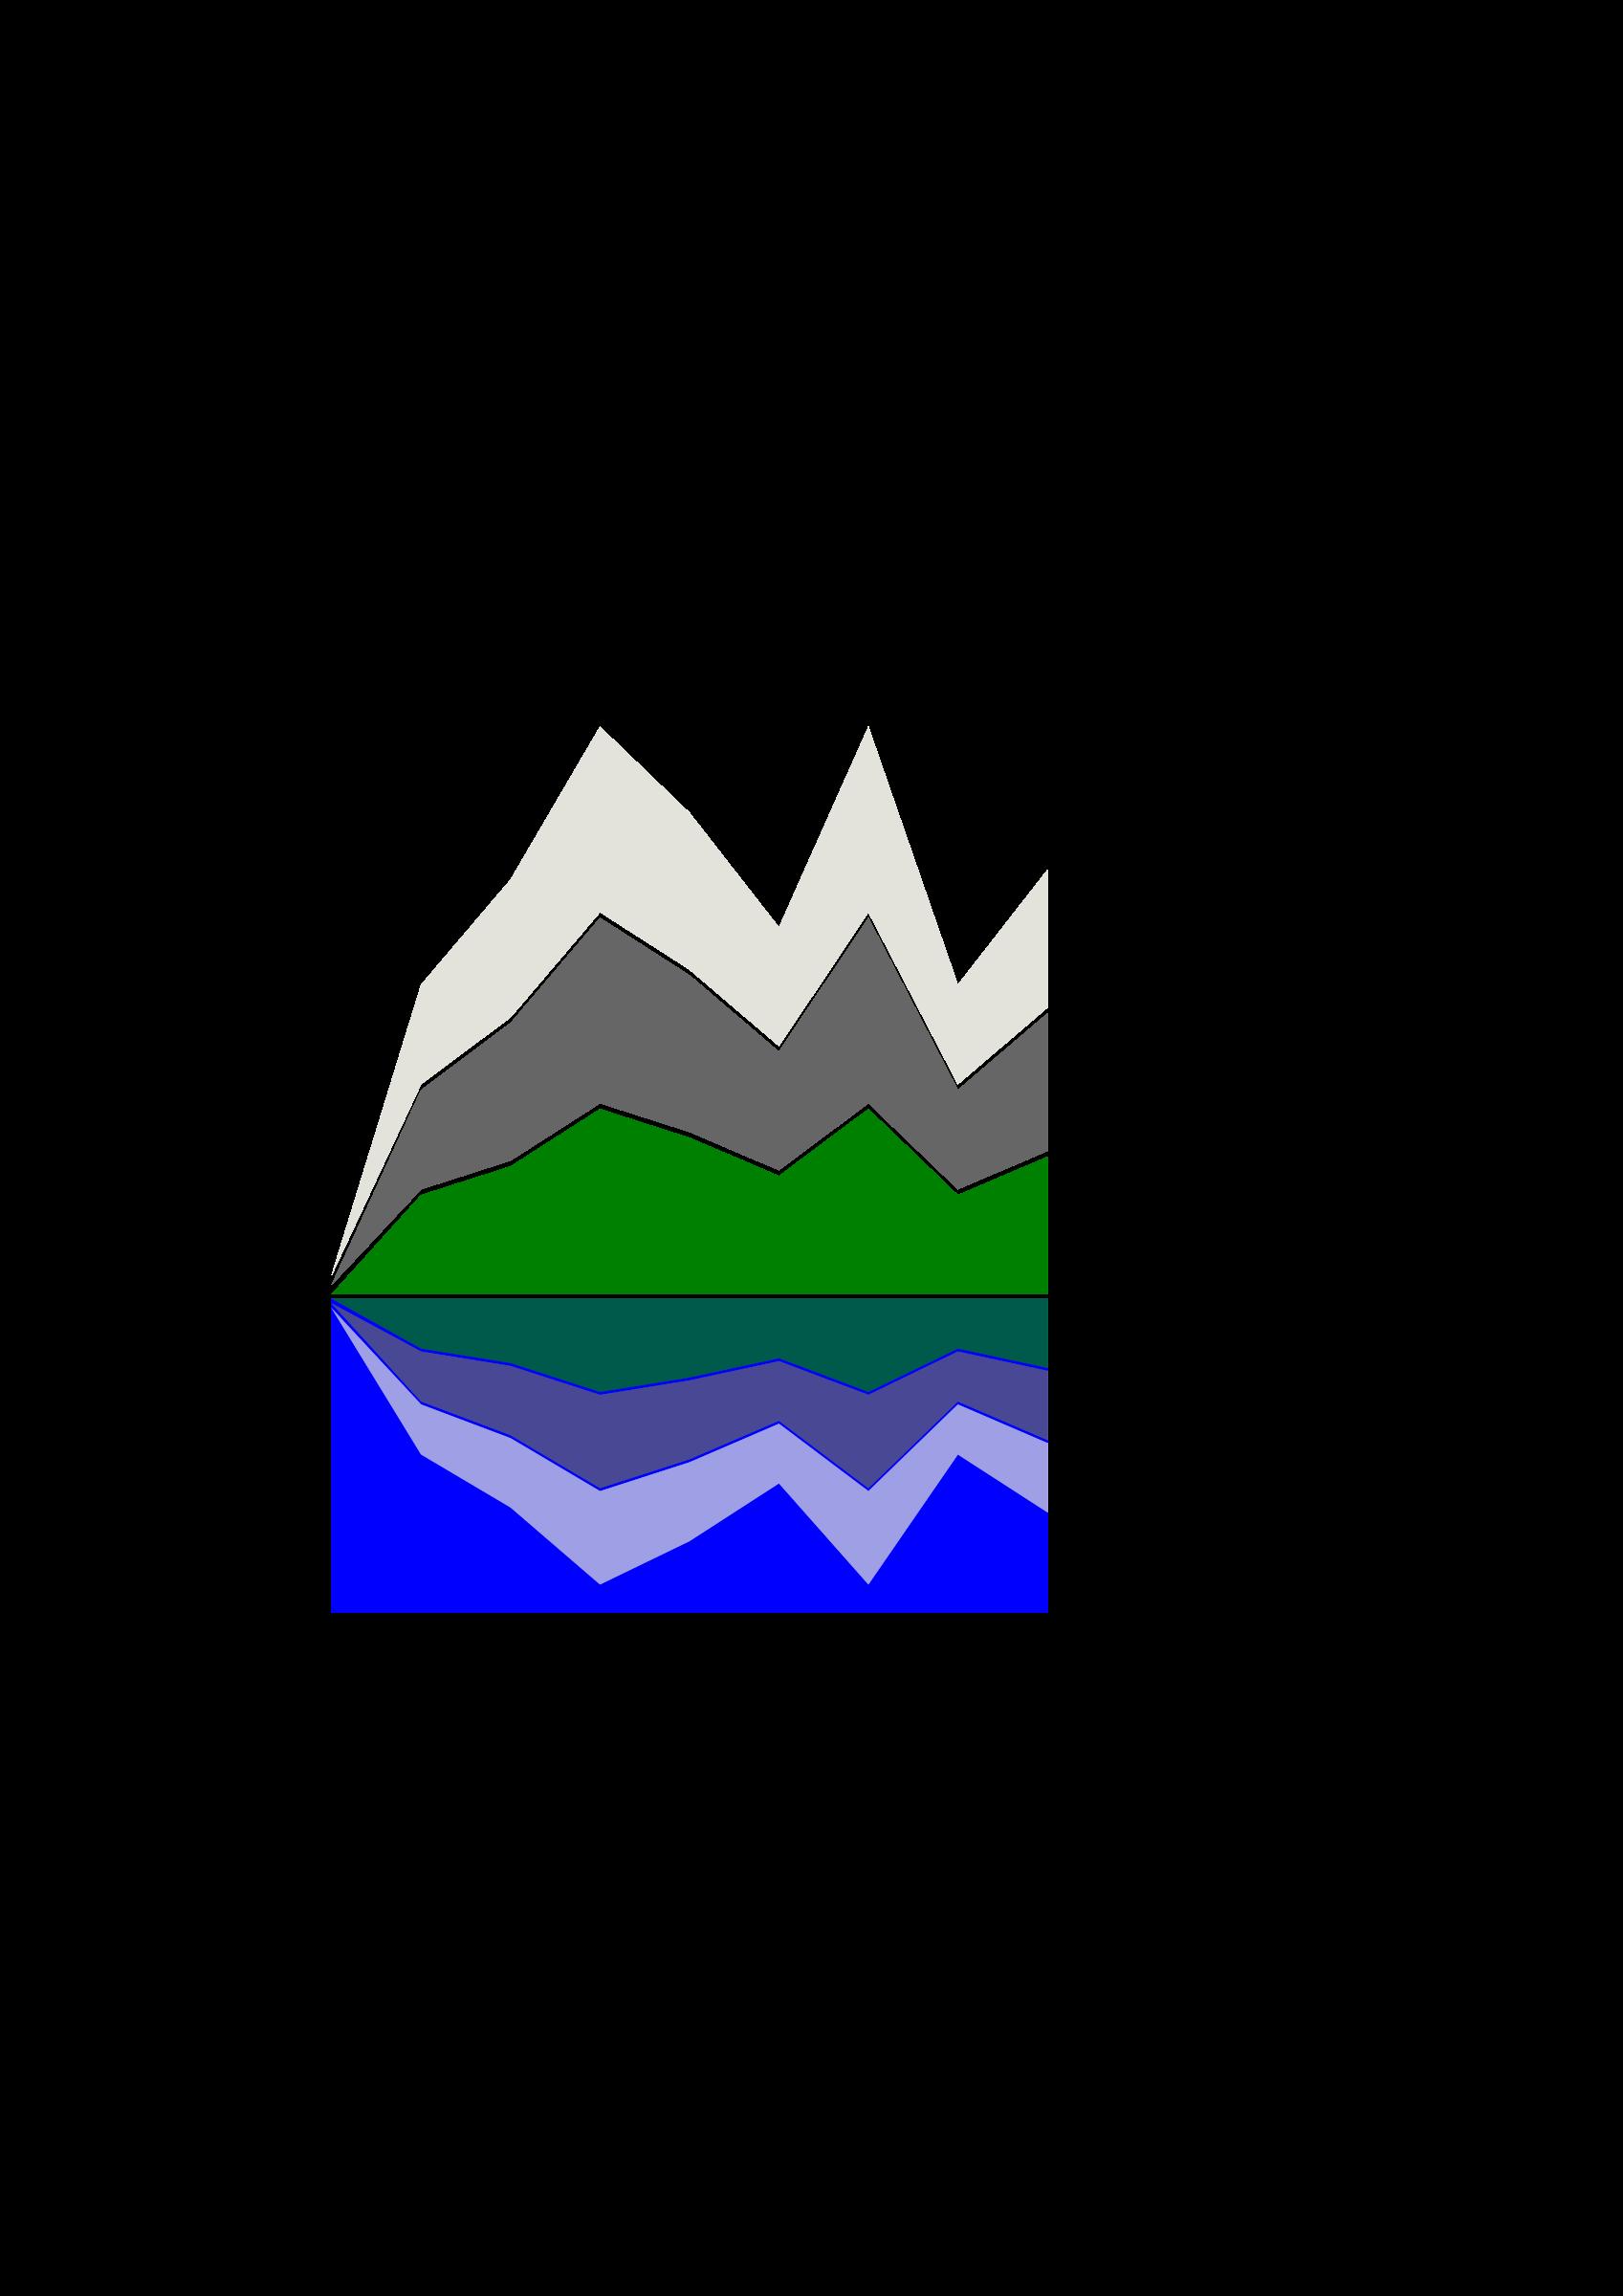 Clipart mountain mountain landscape. Big image png